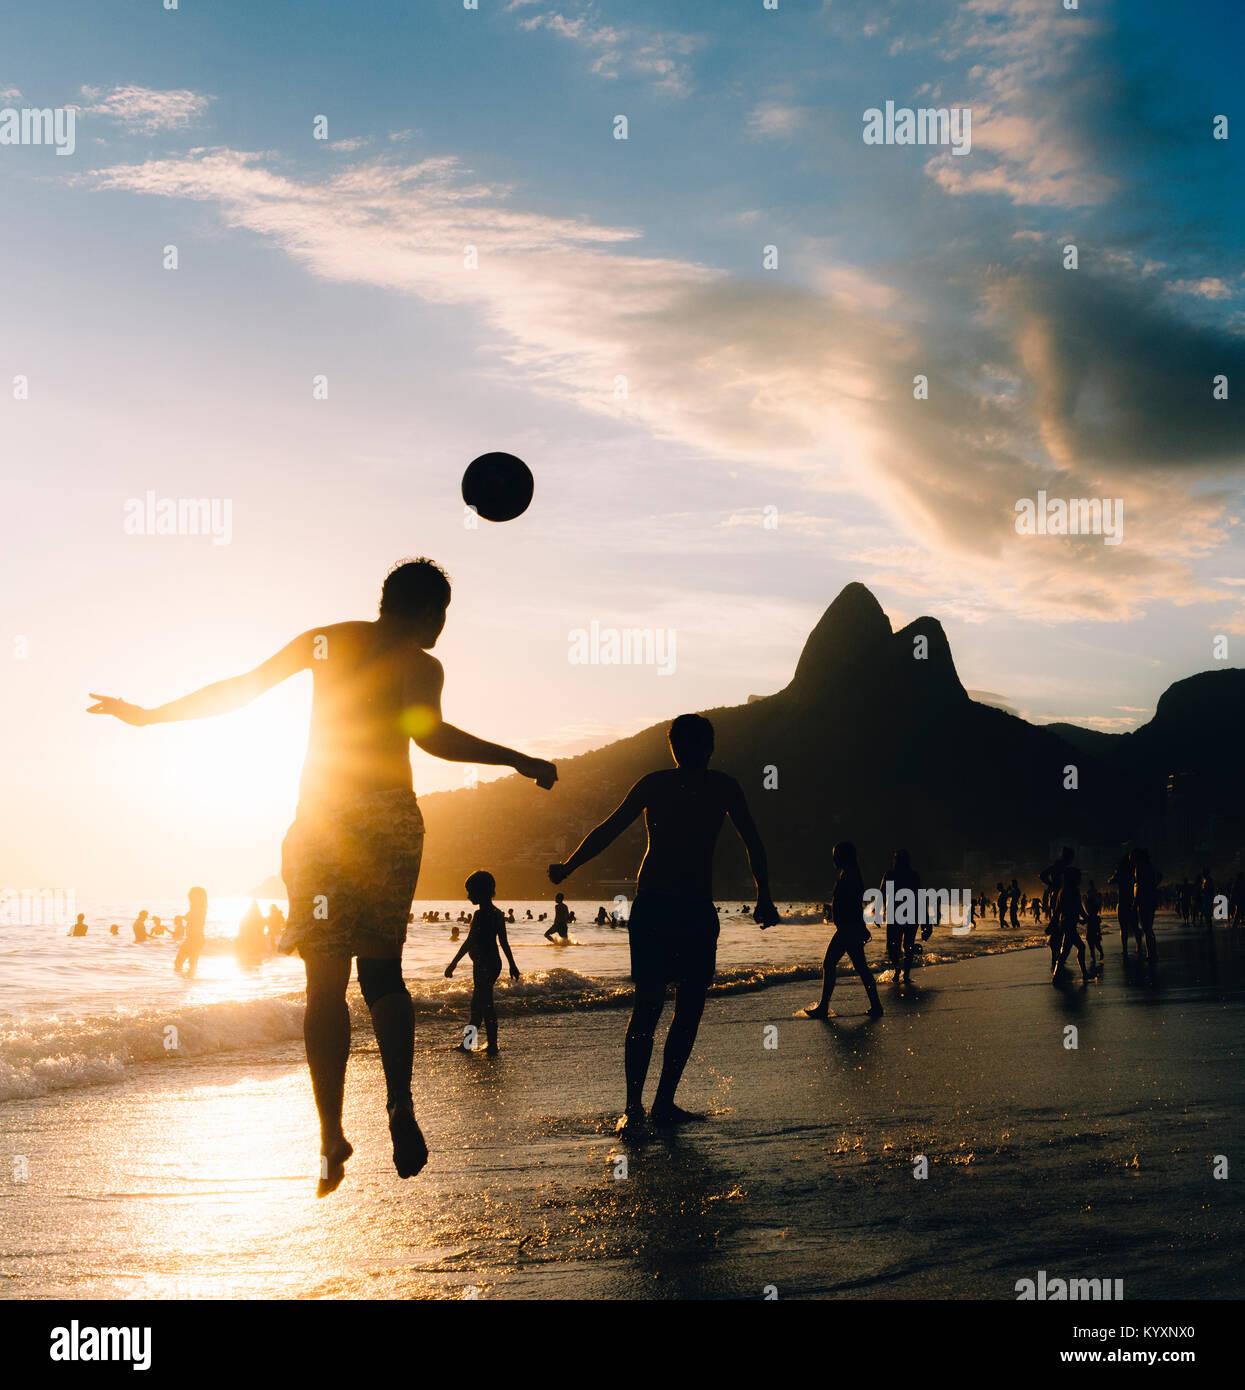 keepy-upply-on-ipanema-beach-rio-de-janeiro-brazil-KYXNX0.jpg